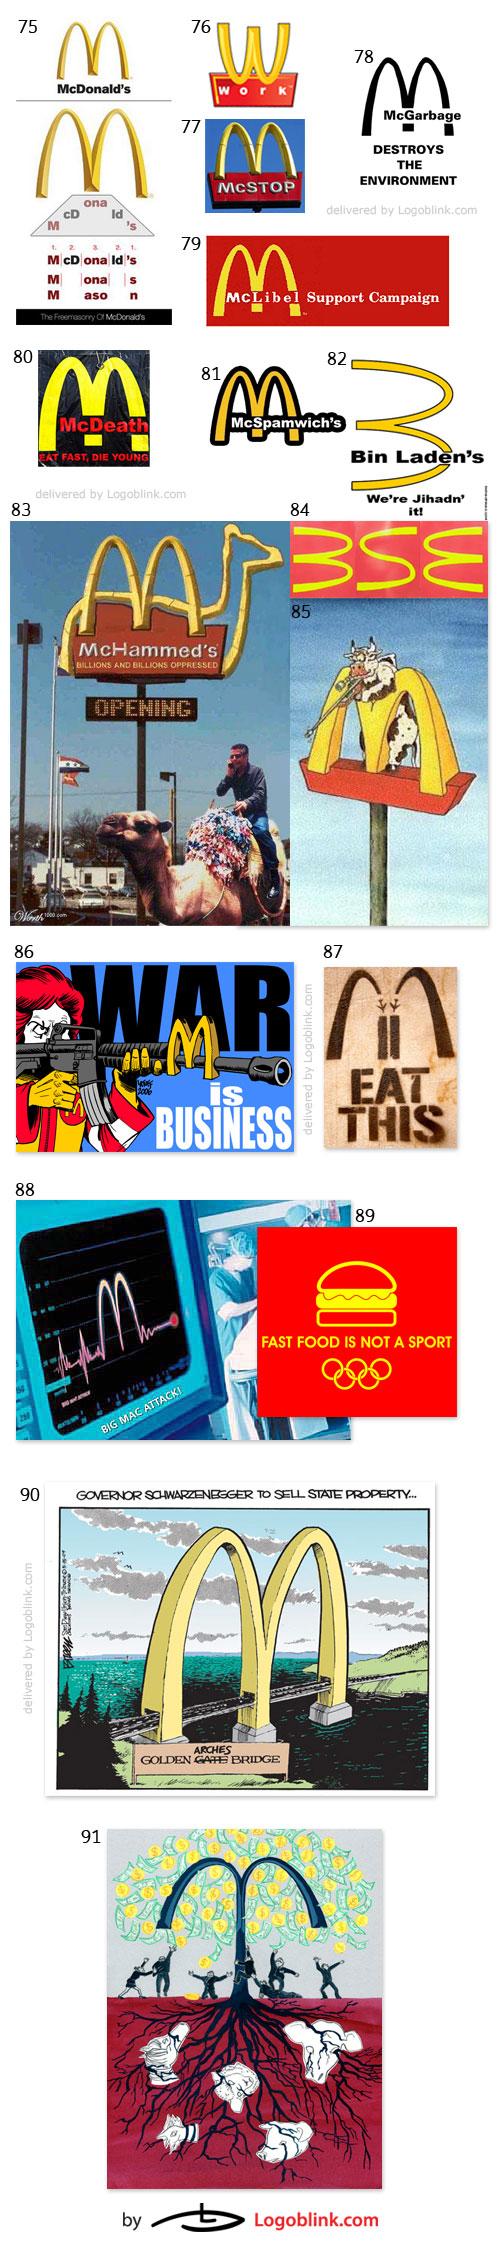 fast food chain logo mania